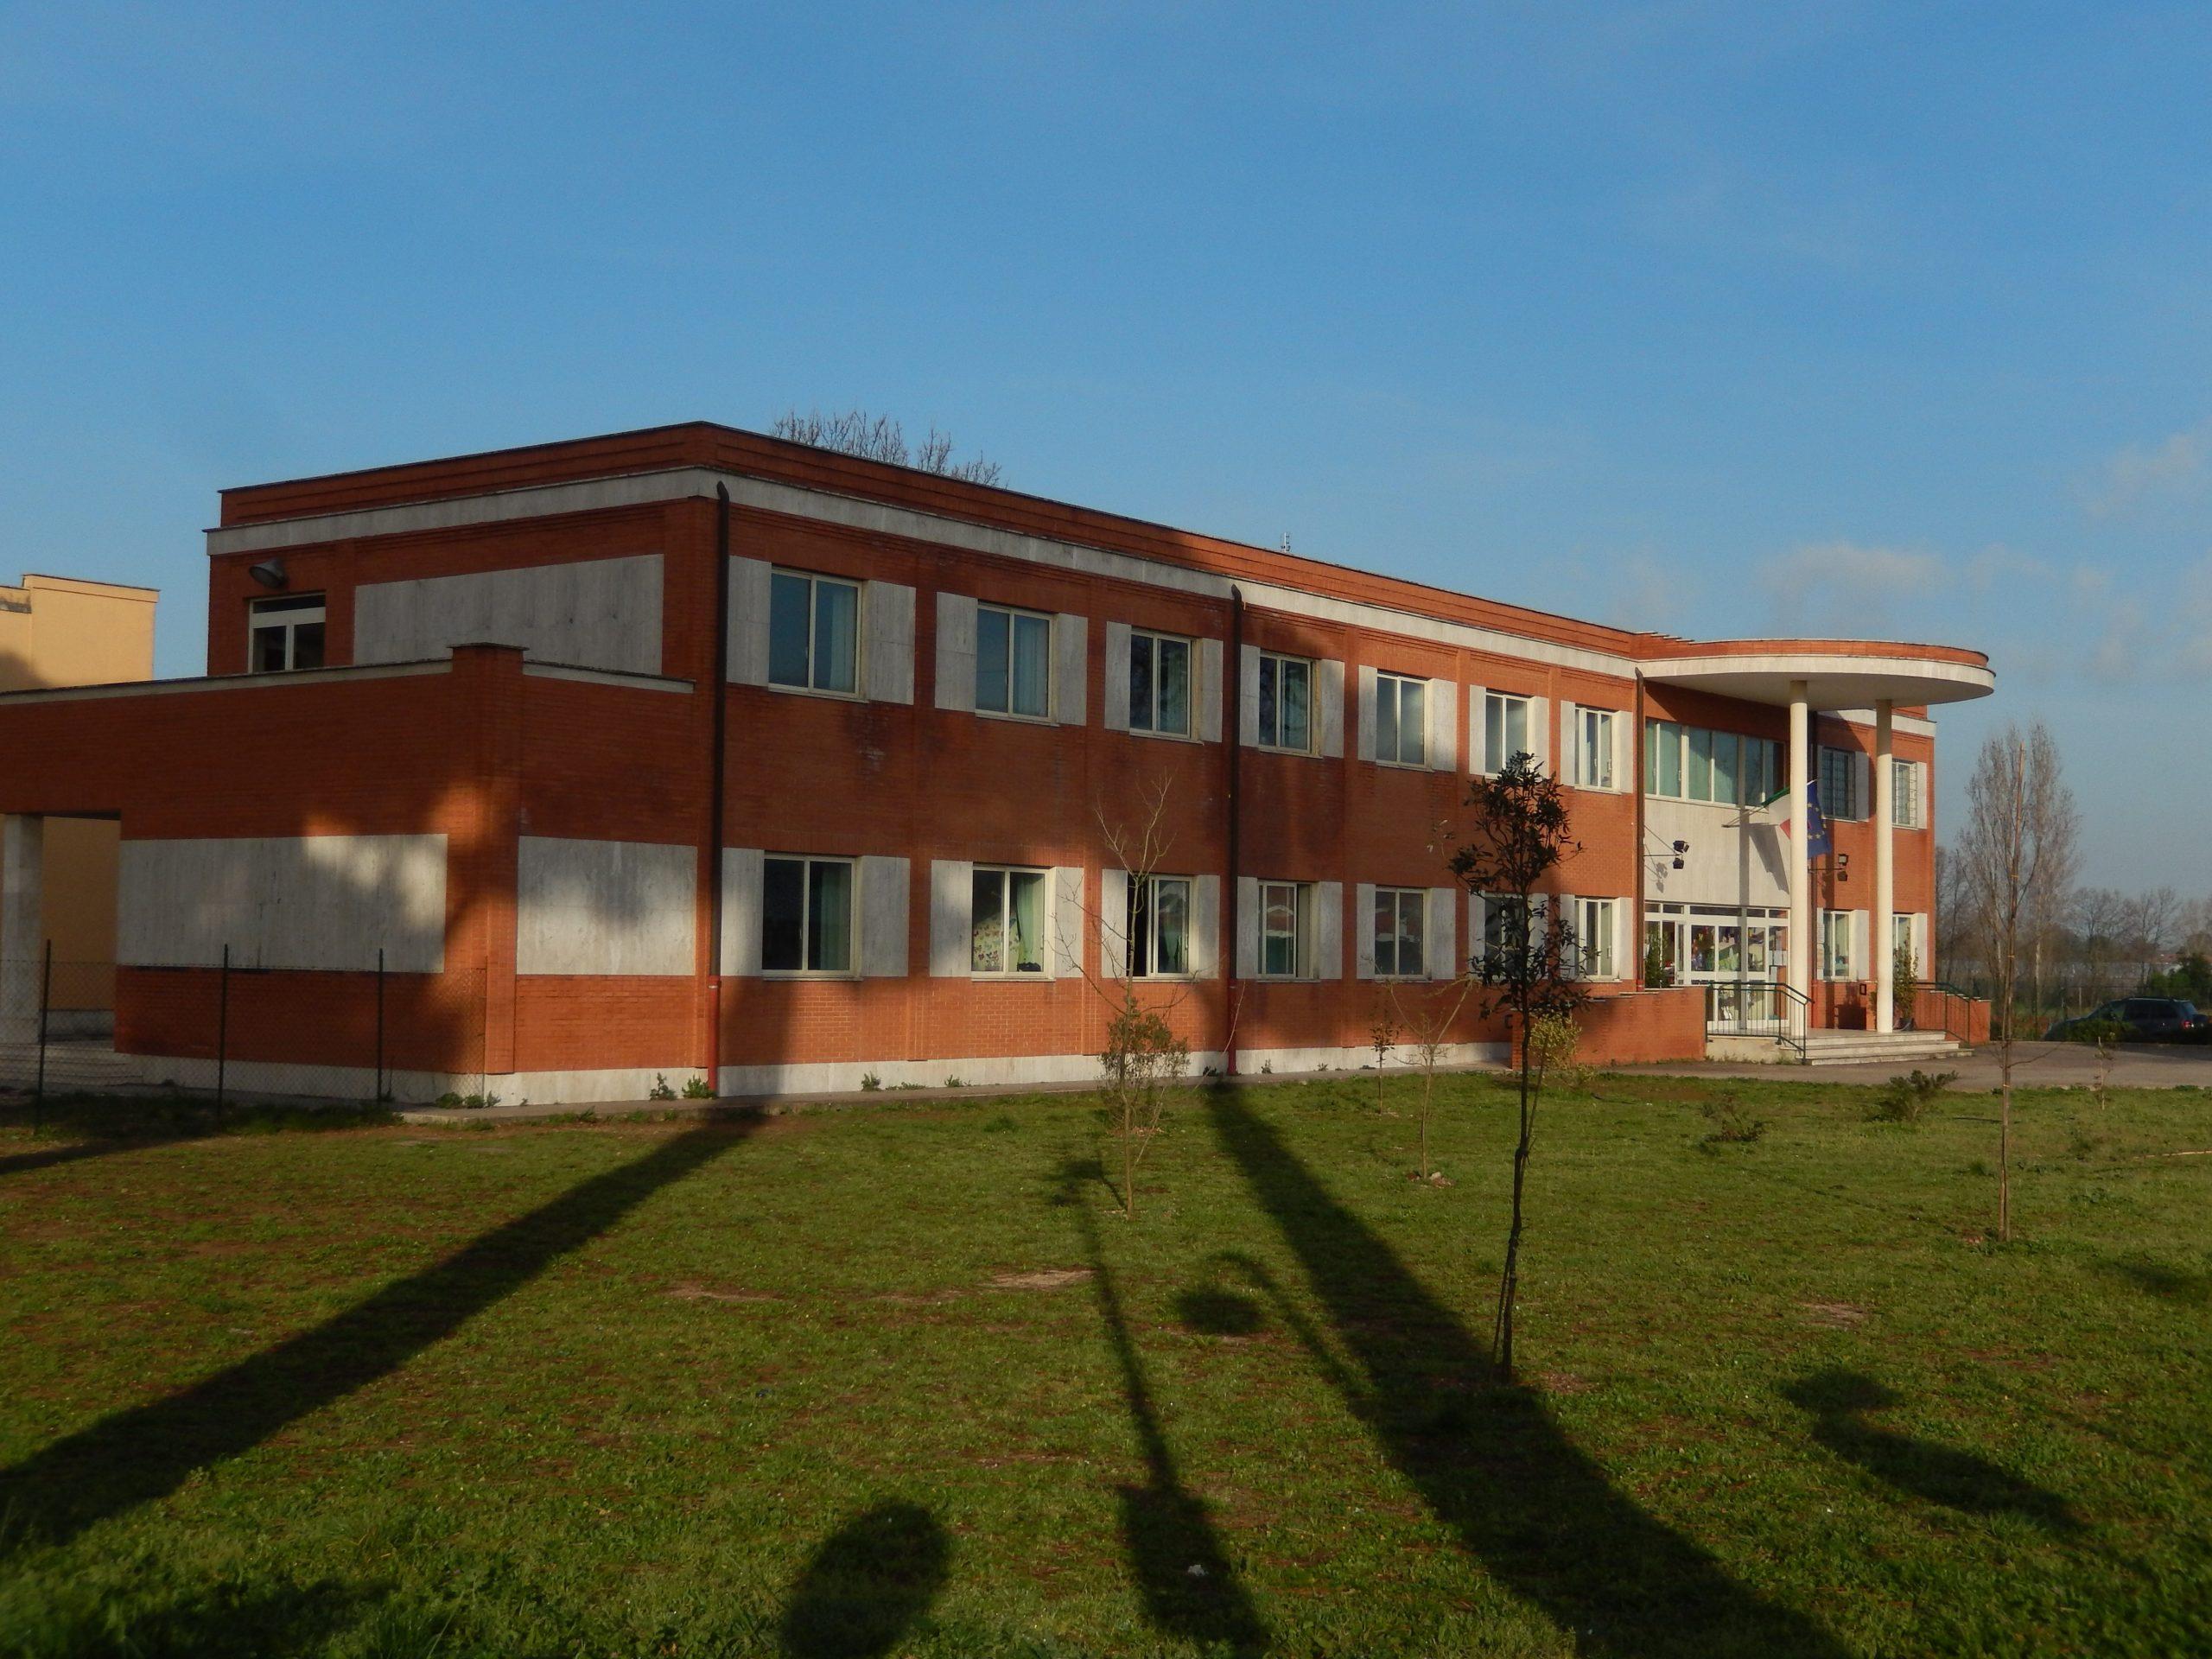 Istituto omnicomprensivo Giulio Cesare, Sabaudia